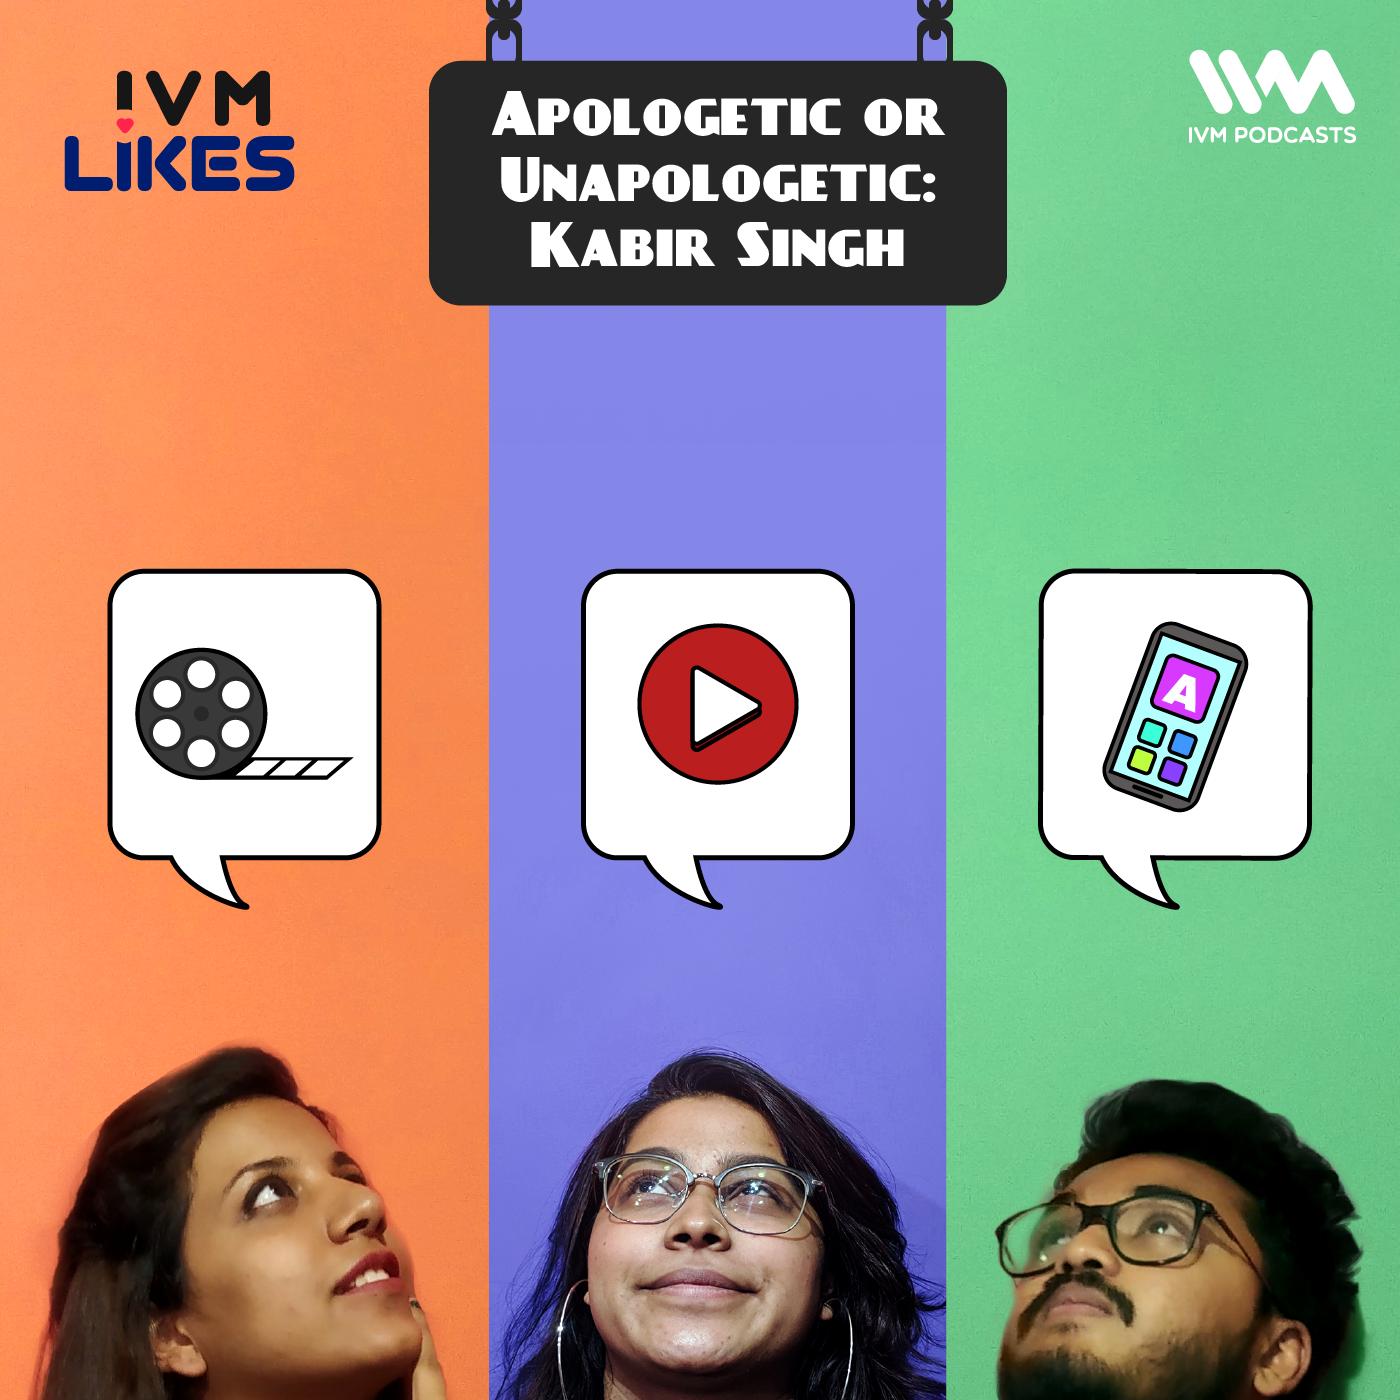 Ep. 127: Apologetic or Unapologetic: Kabir Singh